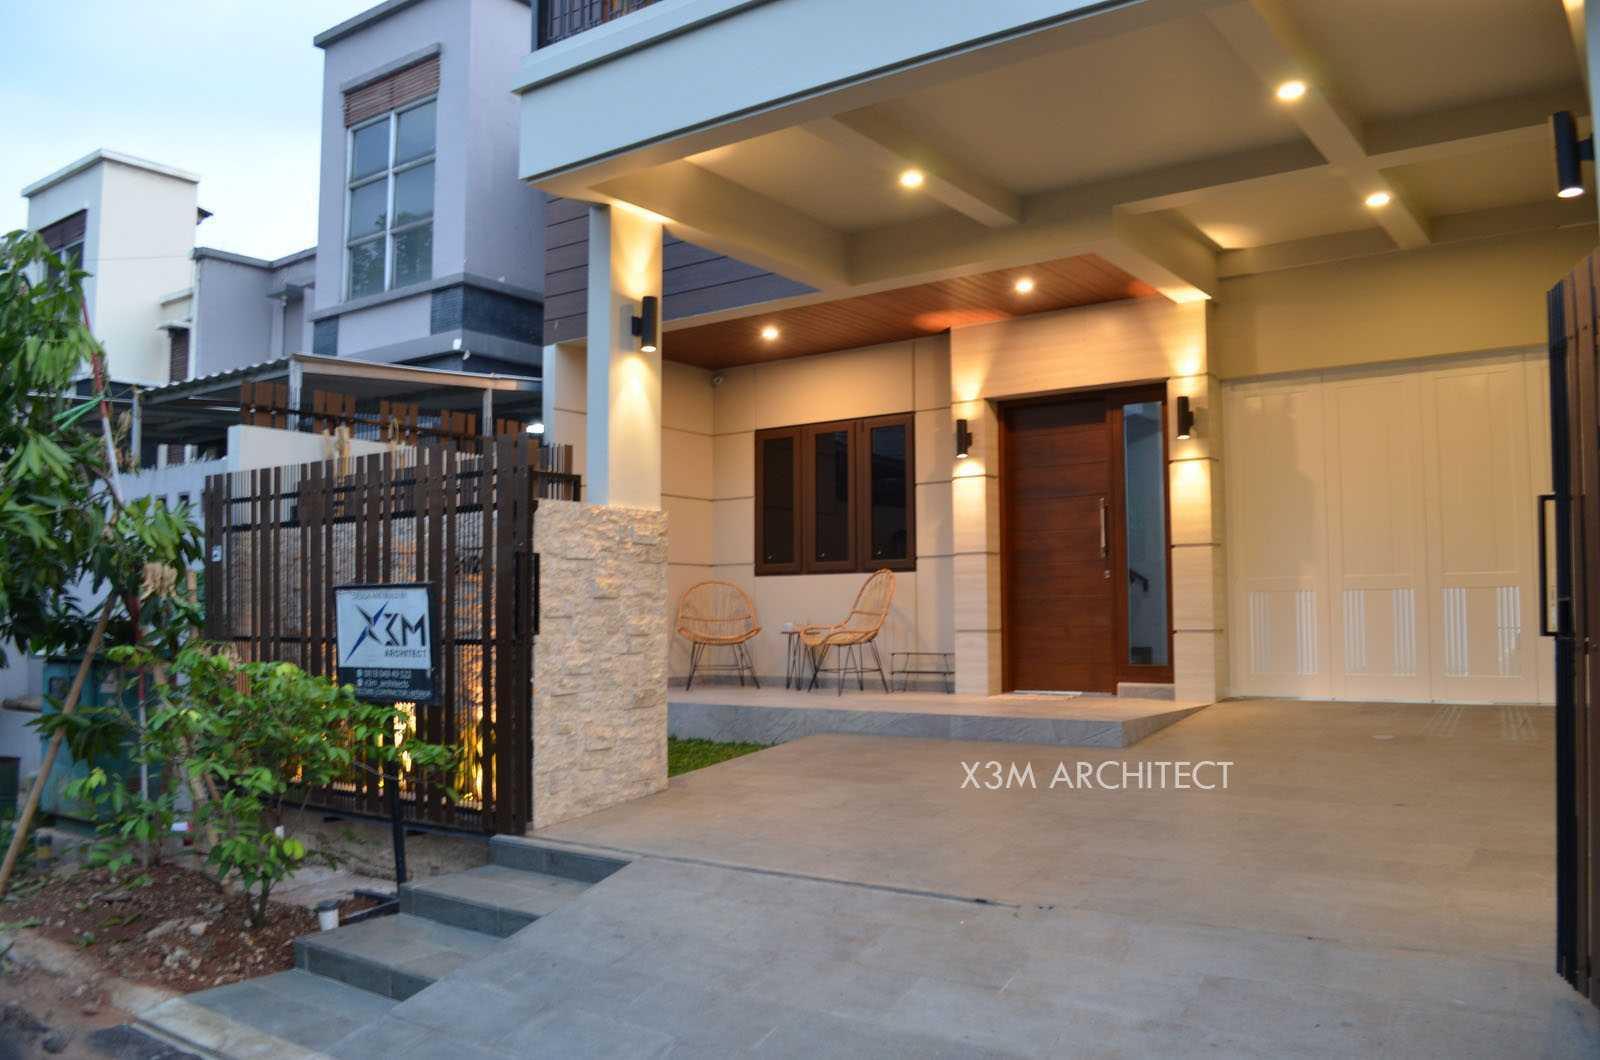 X3M Architects Gl Residence Berjaya Asia Bsd Office 2Th Floor Jl. Griya Loka Raya Bj-26, Rw. Buntu, Kec. Serpong, Kota Tangerang Selatan, Banten 15318, Indonesia Berjaya Asia Bsd Office 2Th Floor Jl. Griya Loka Raya Bj-26, Rw. Buntu, Kec. Serpong, Kota Tangerang Selatan, Banten 15318, Indonesia X3M-Architects-Gl-Residence  101572